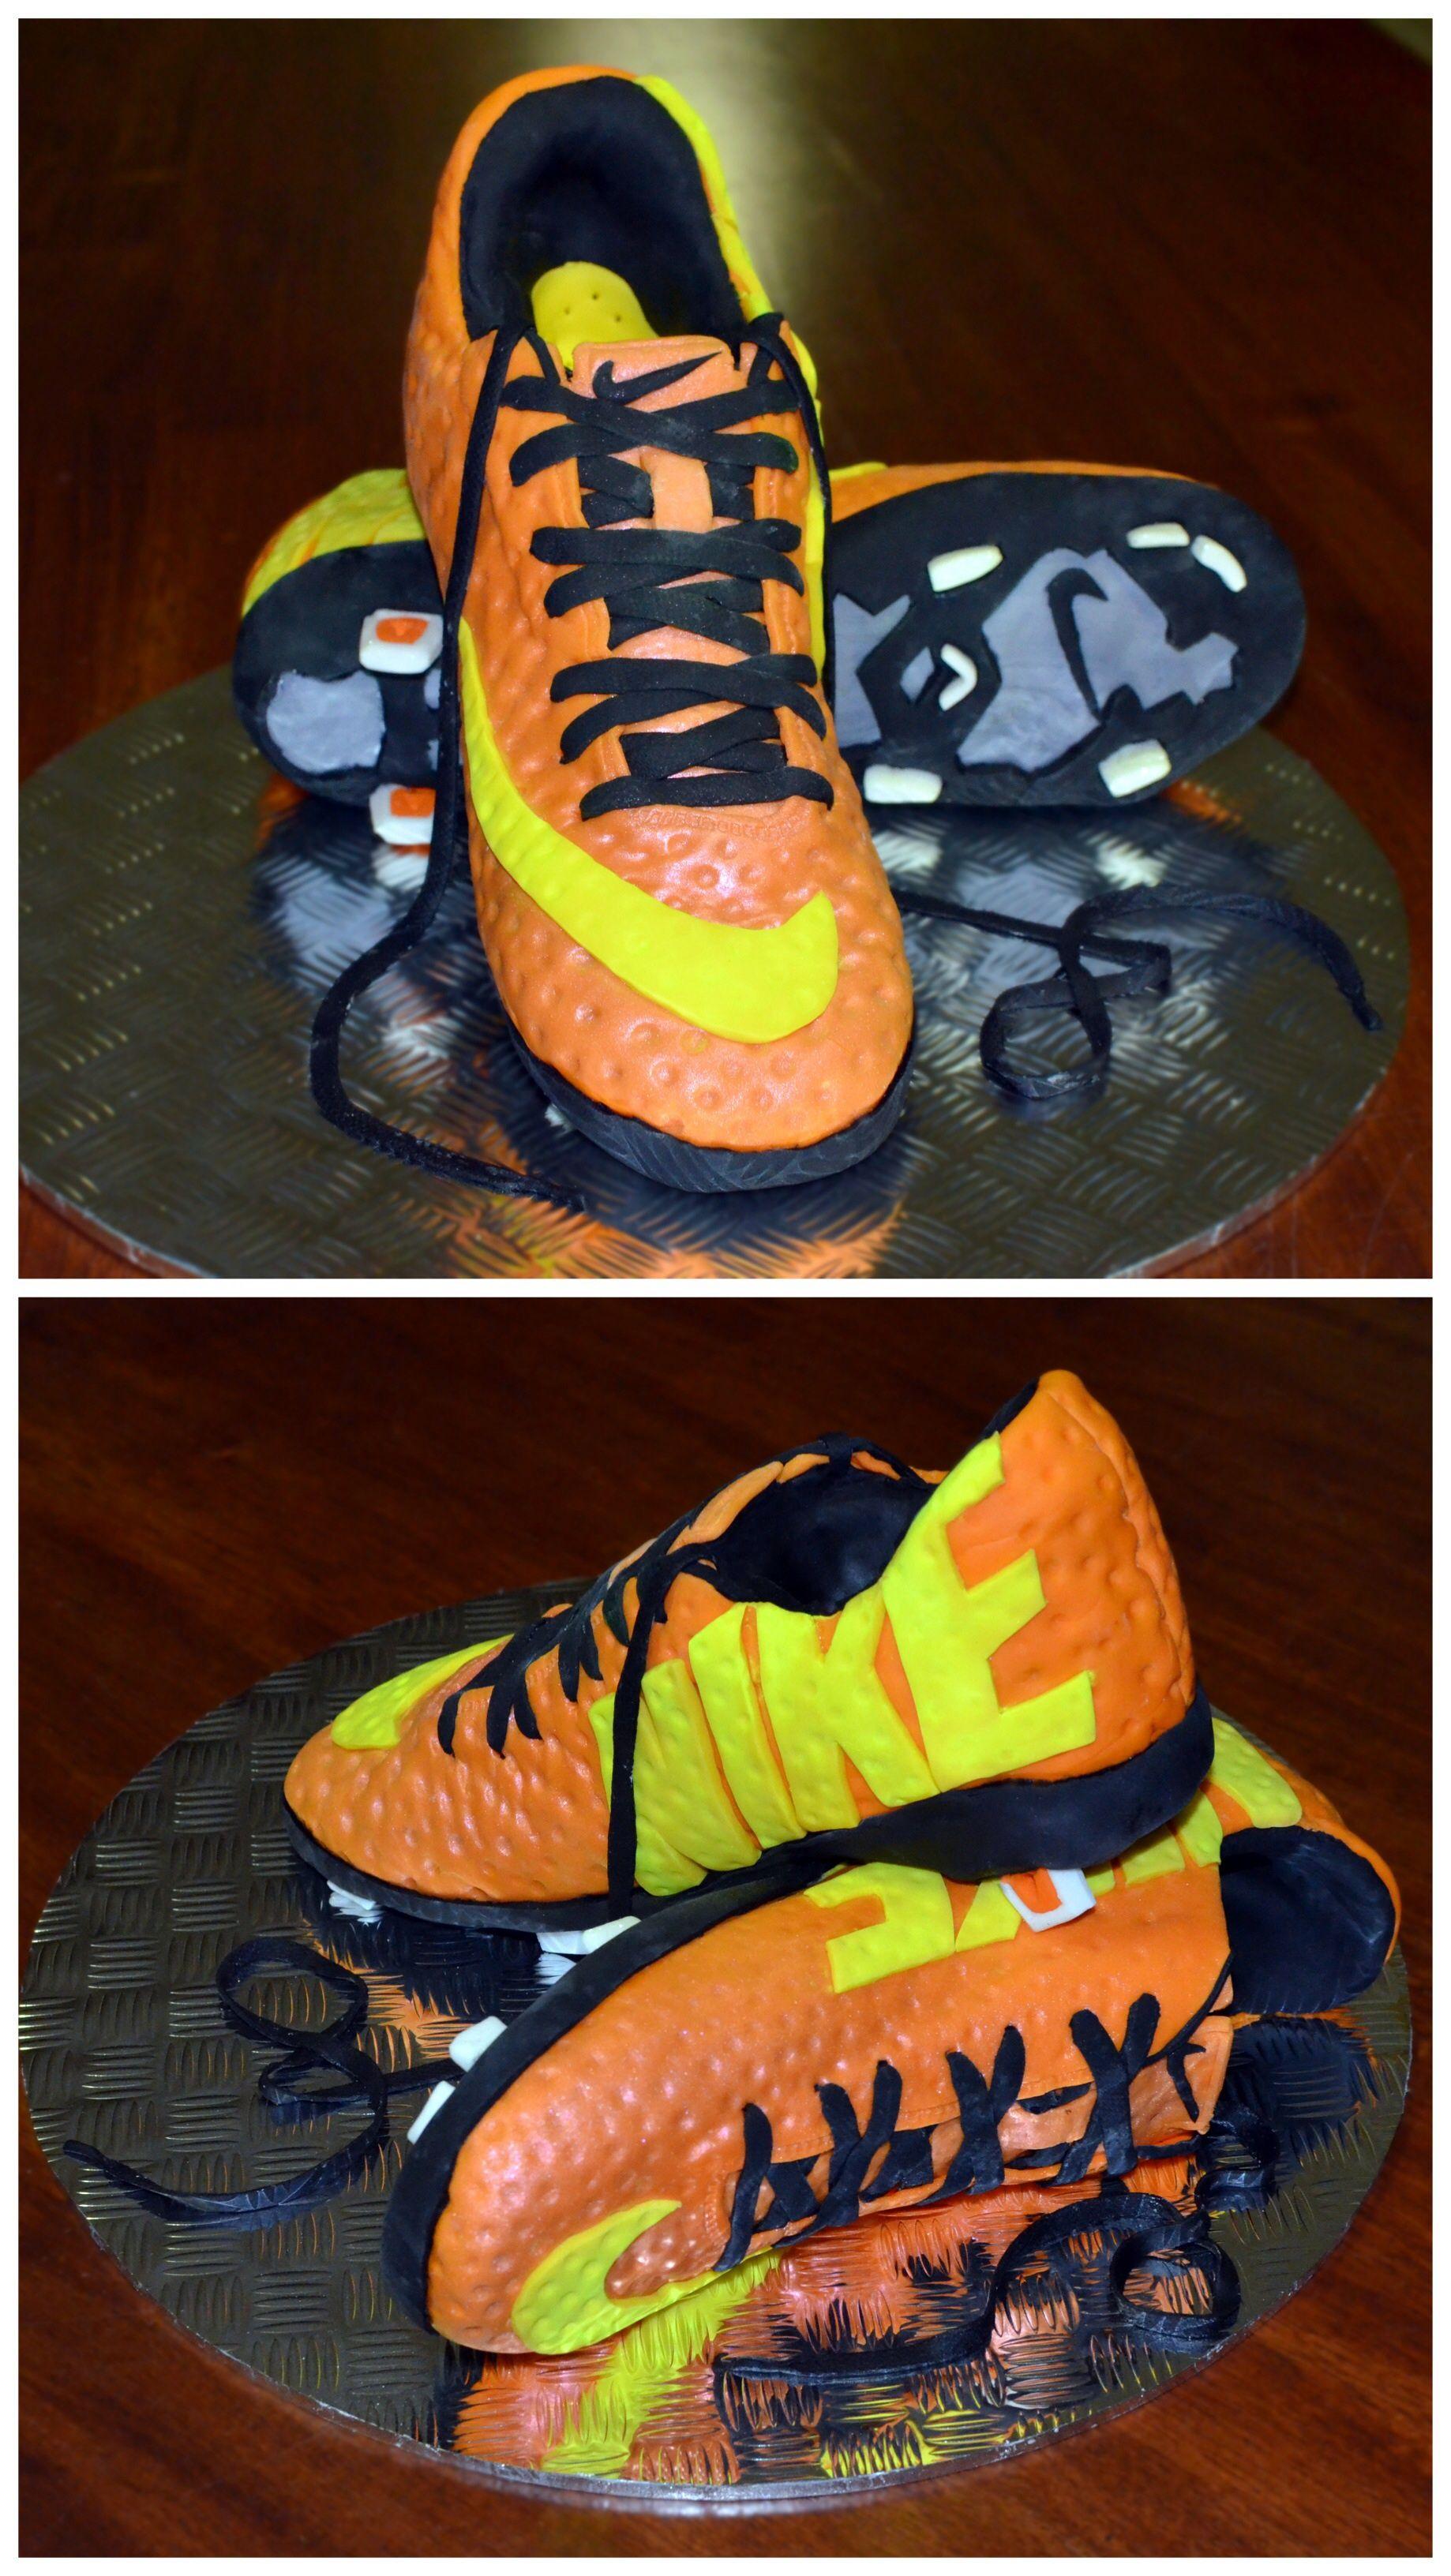 Nike Mercurial Vapor IX Football Boots cake.